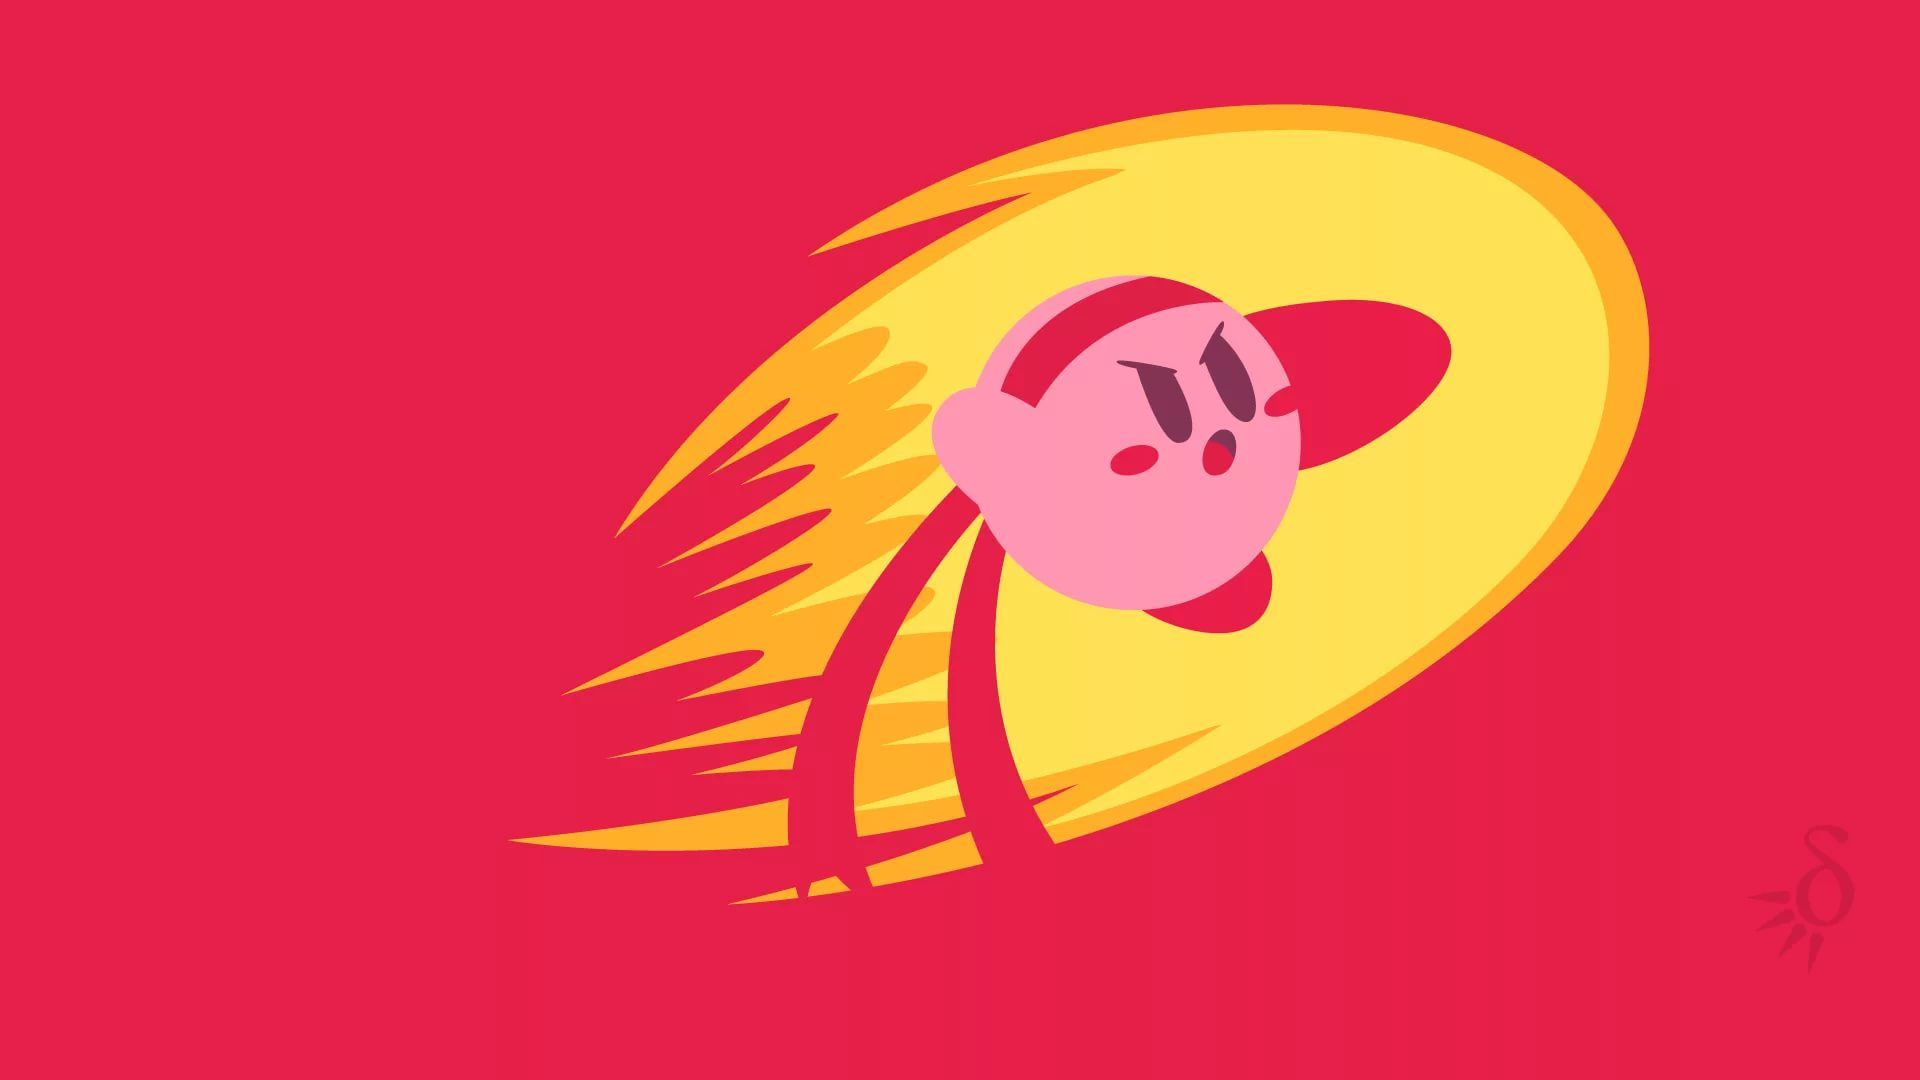 Kirby free download wallpaper